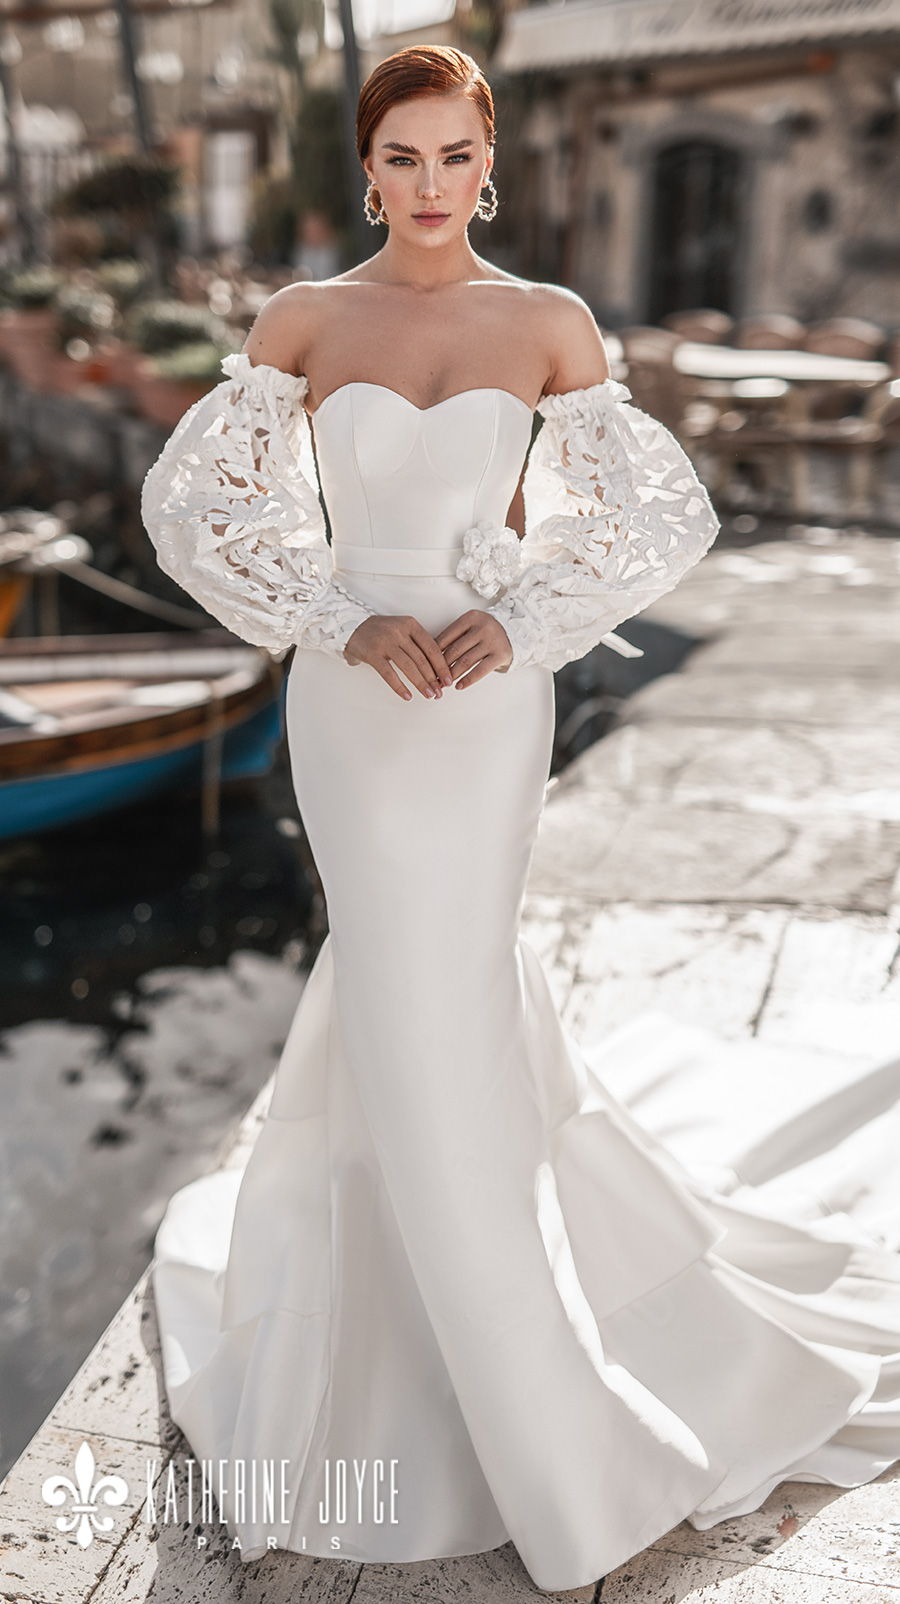 katherine joyce 2021 naples bridal off the shoulder long bishop sleeves sweetheart neckline simple minimalist elegant mermaid wedding dress mid back chapel train (cloudi) mv